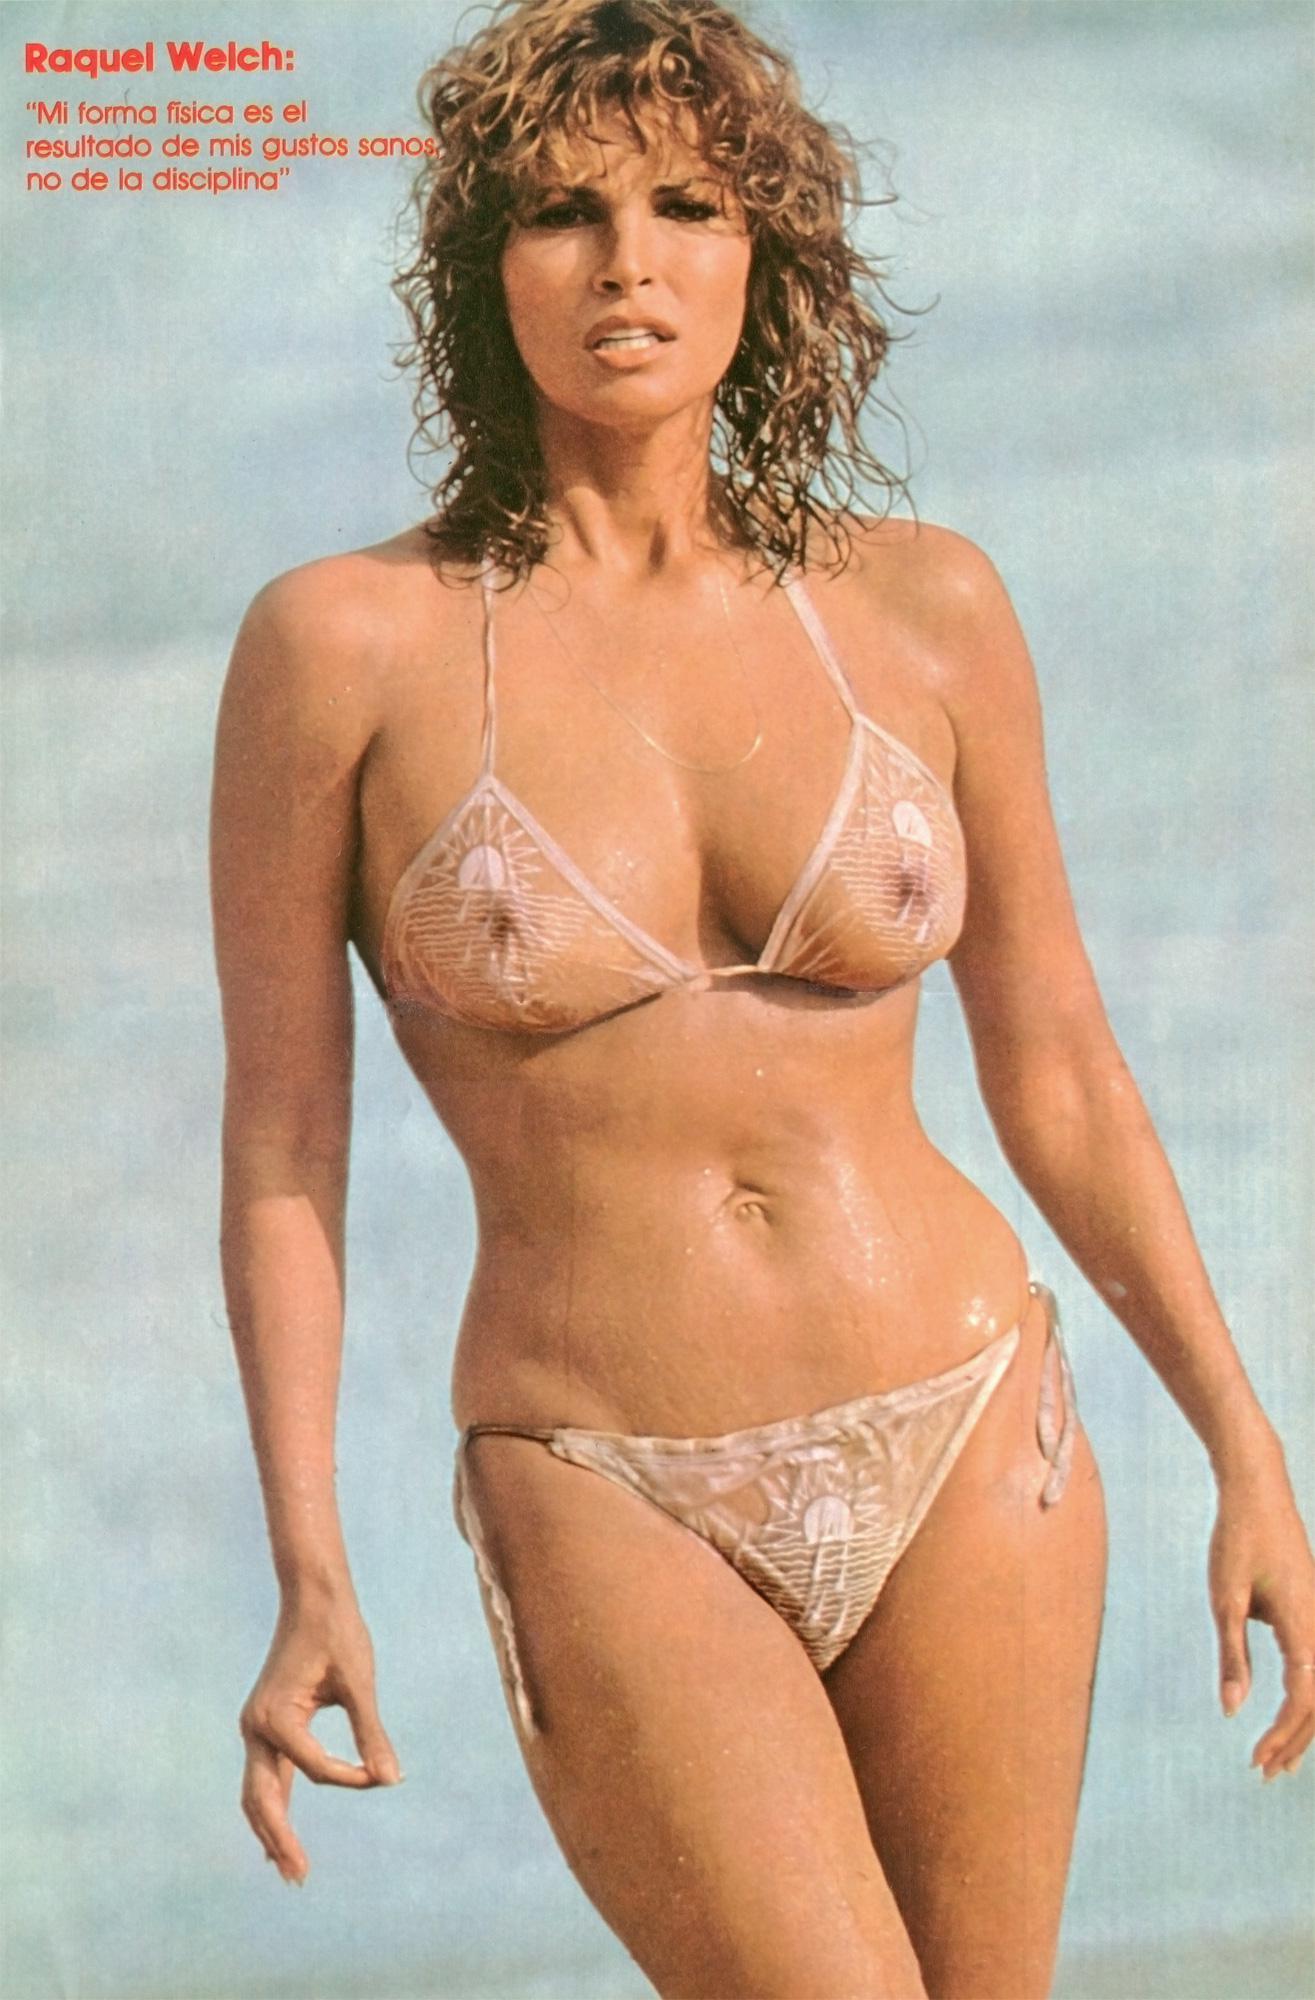 Rachel welch actriz desnuda